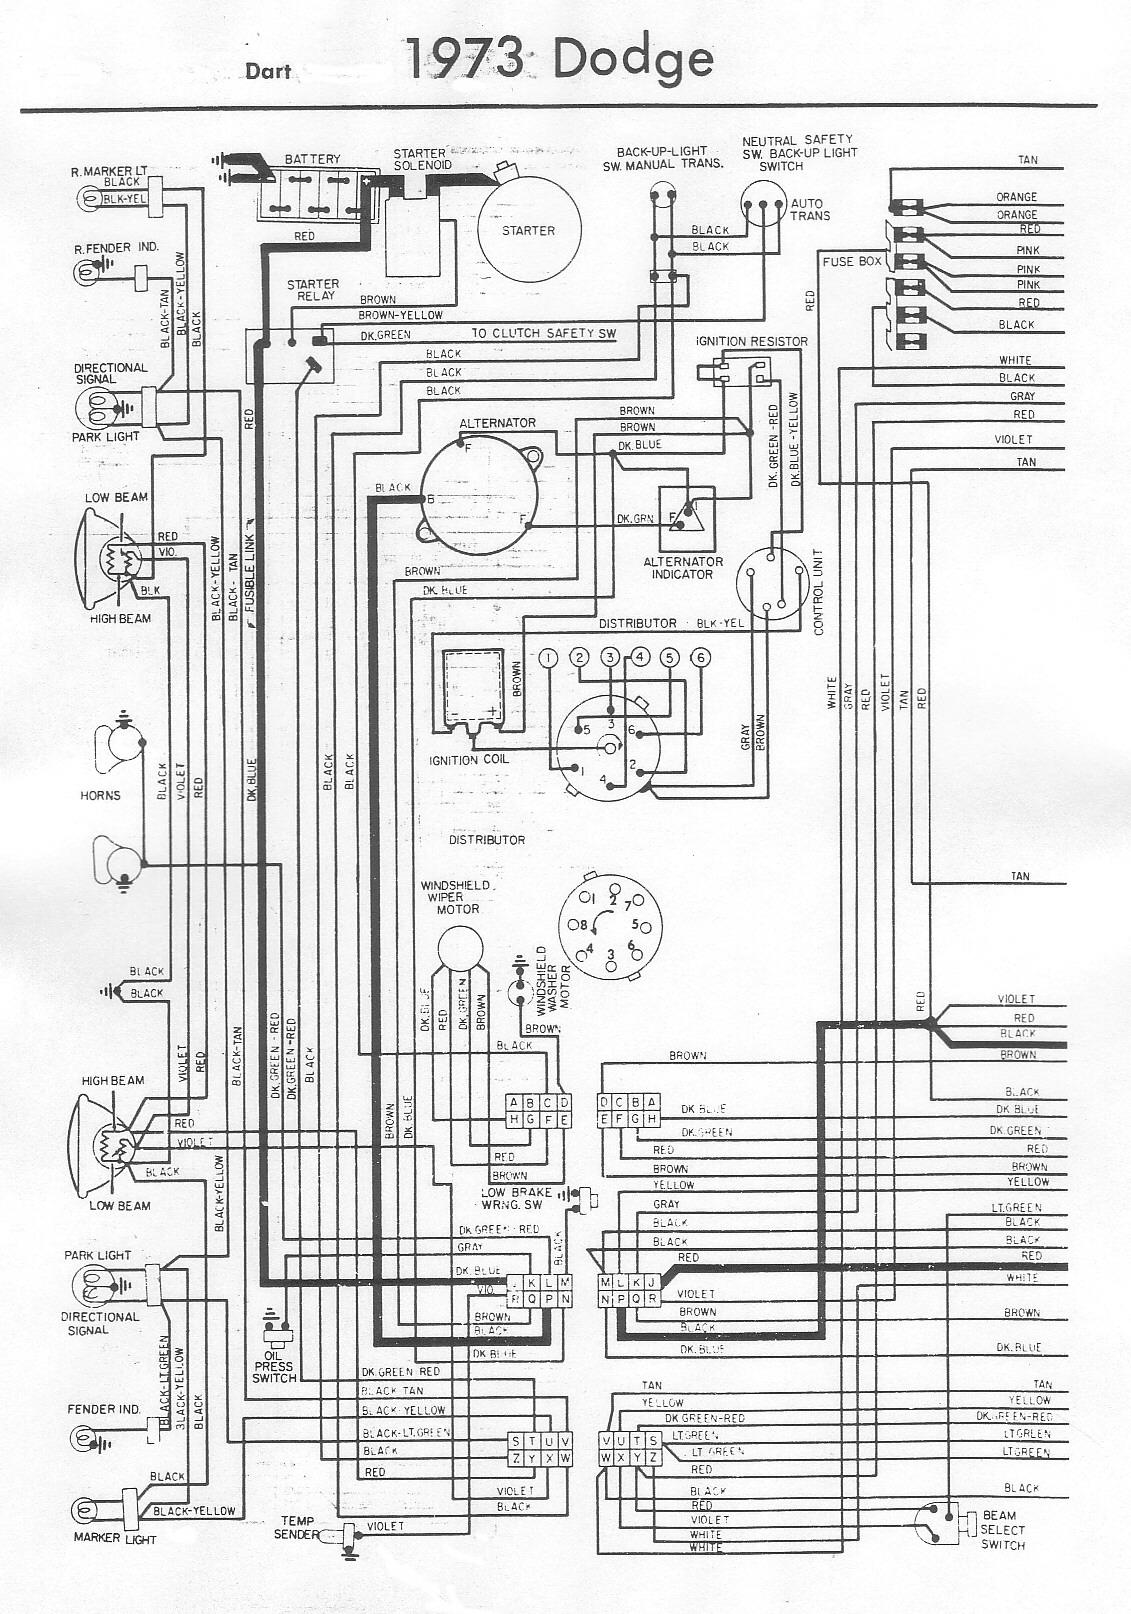 wiring diagram for 1973 dodge dart wiring diagrams tar 1969 dodge dart wiring diagram 73 dodge [ 1131 x 1614 Pixel ]